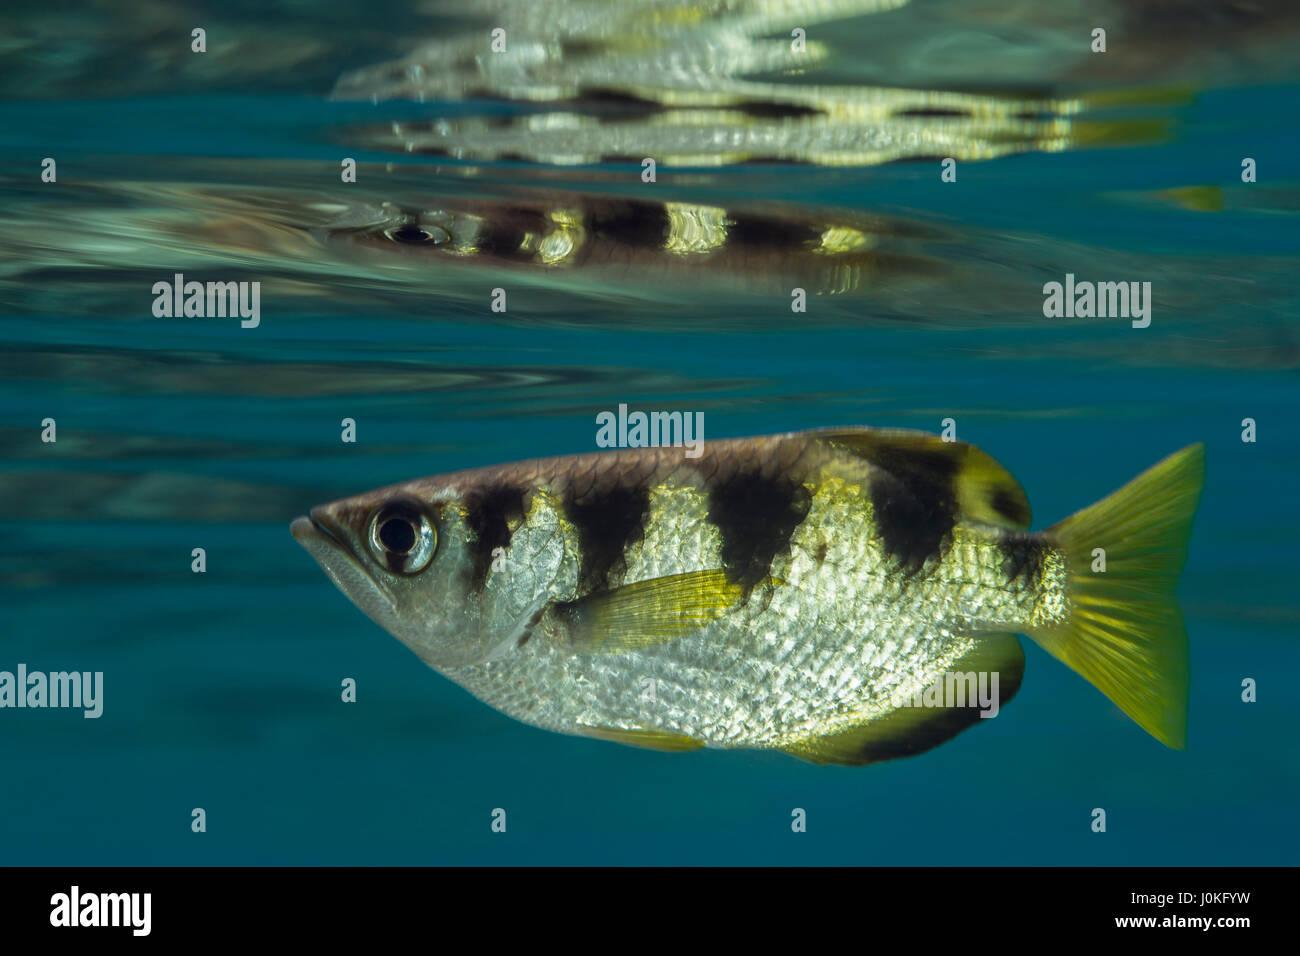 Archerfish, Toxotes jaculatrix anillados, Raja Ampat, Papua Occidental, Indonesia Imagen De Stock